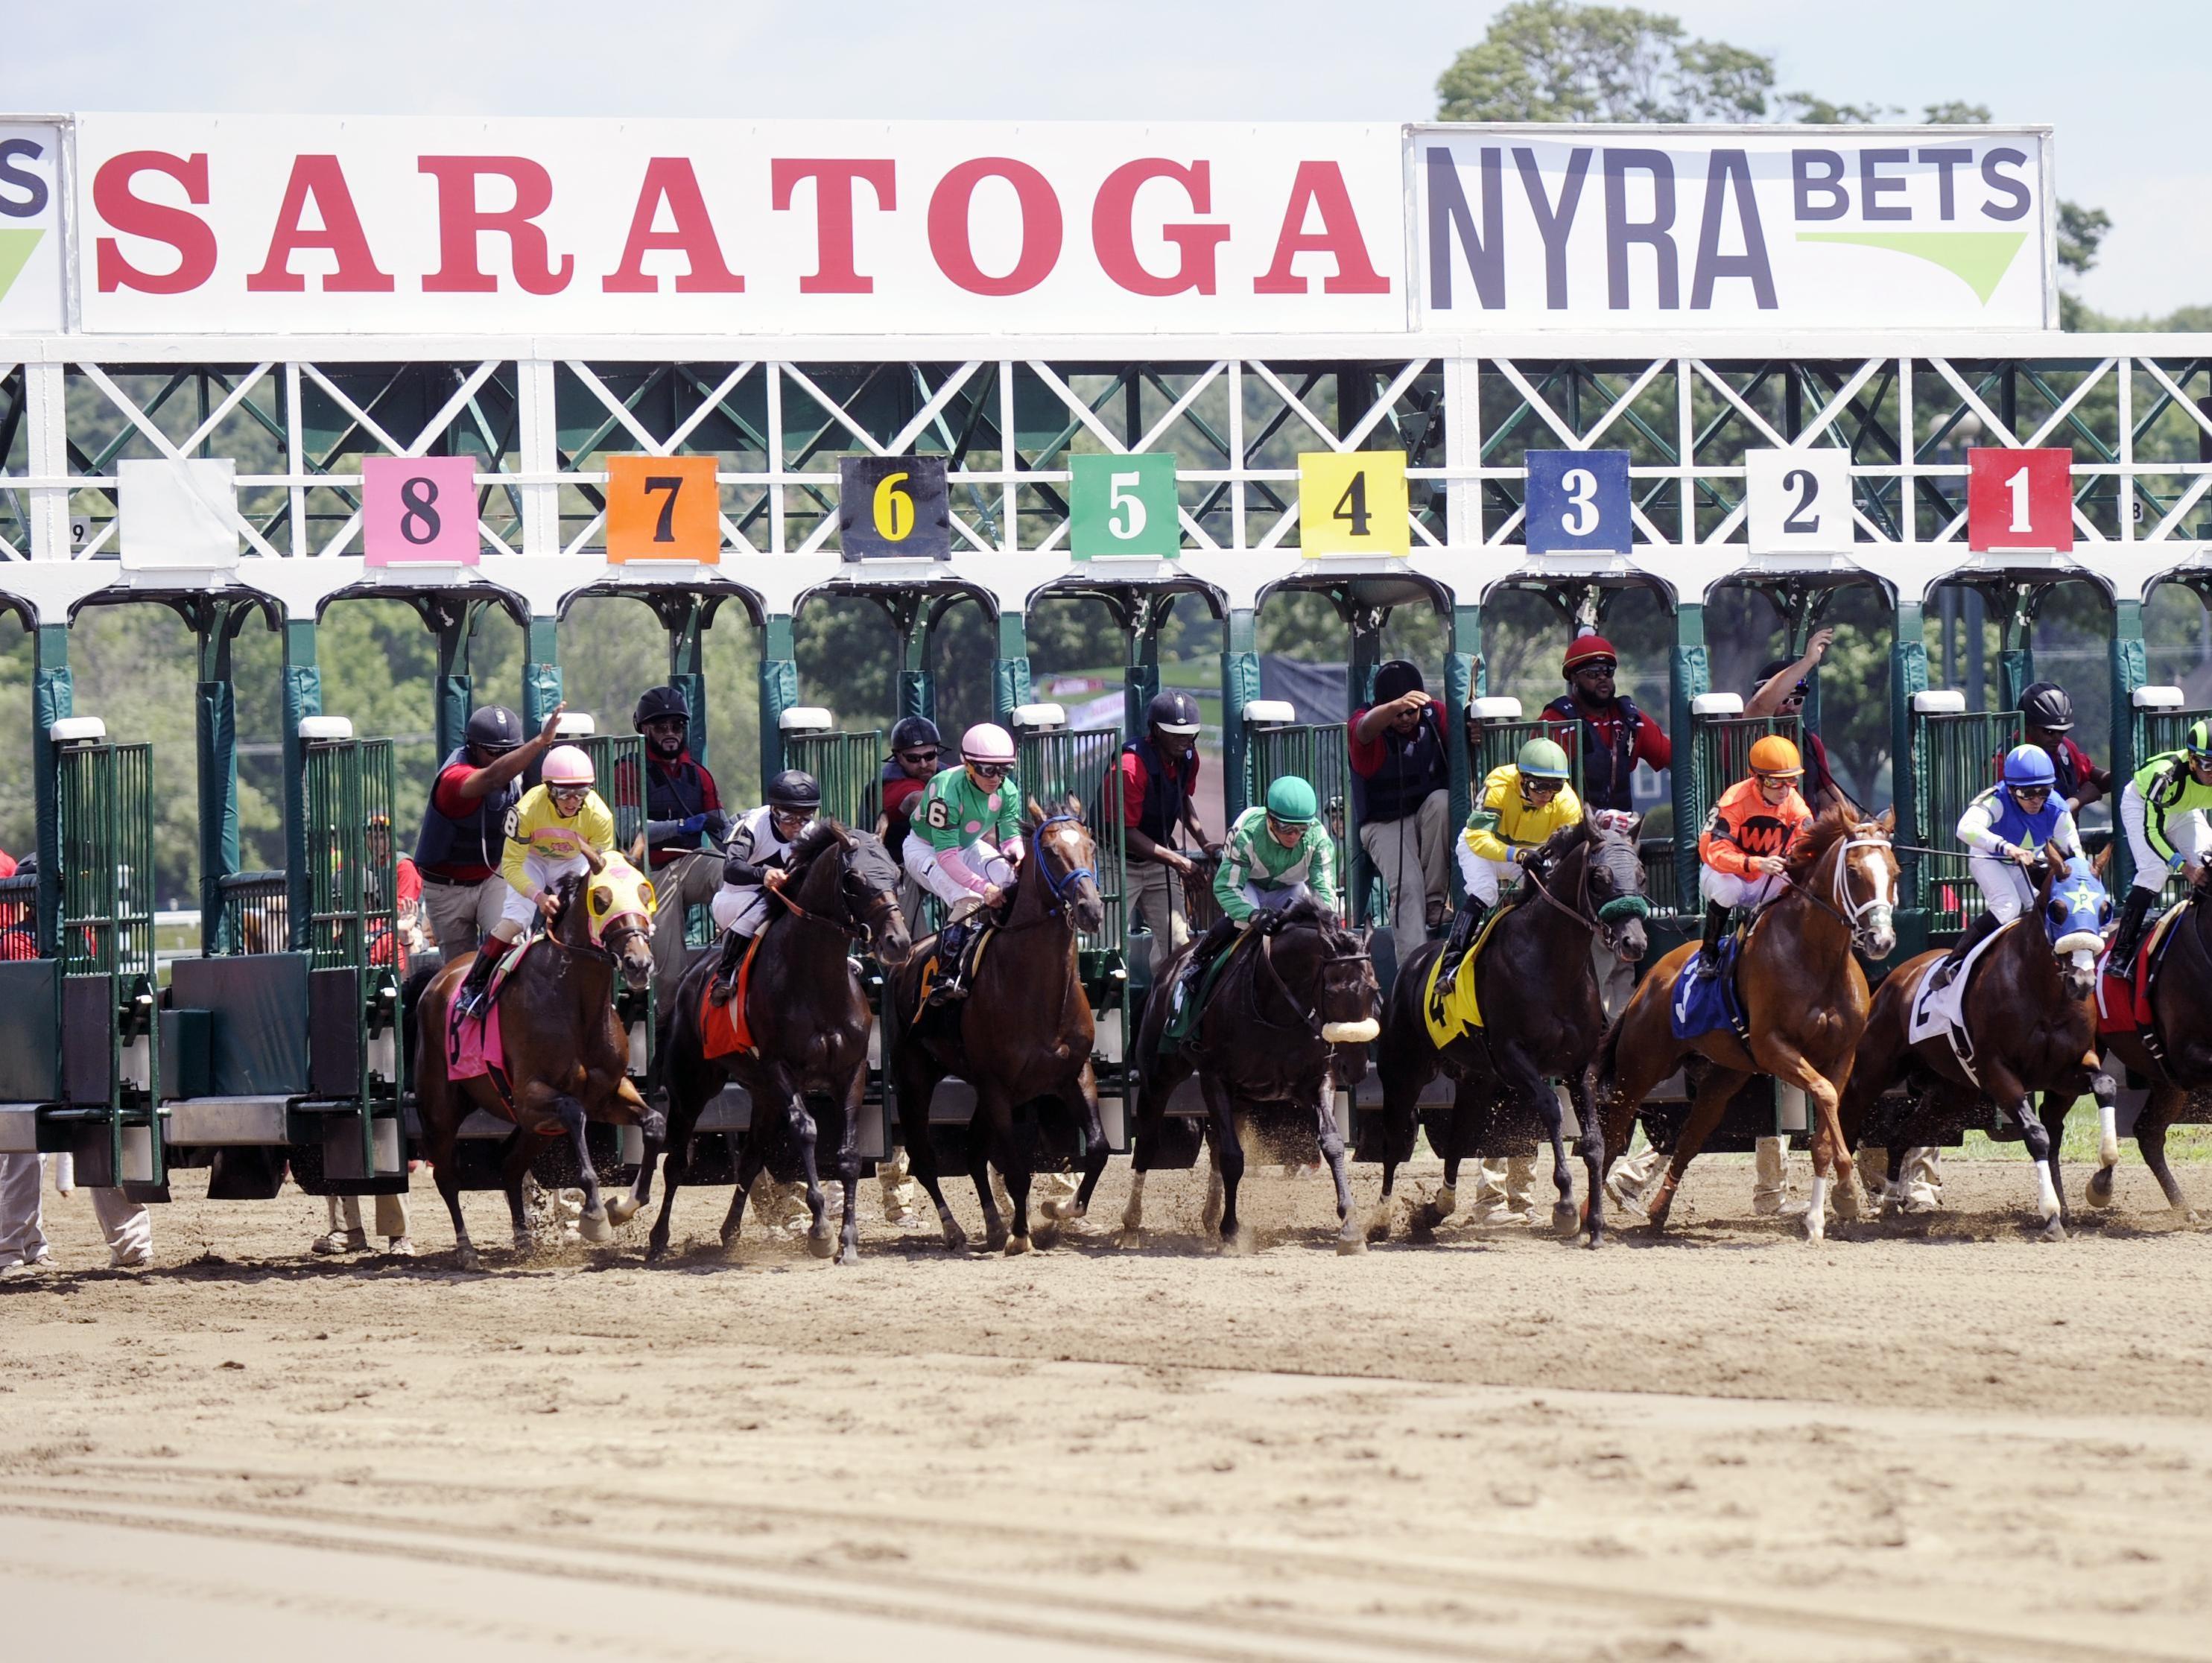 HORSE RACING AT SARATOGA THE START GRANDSTAND SPECTATORS SADDLE HORSE RACE